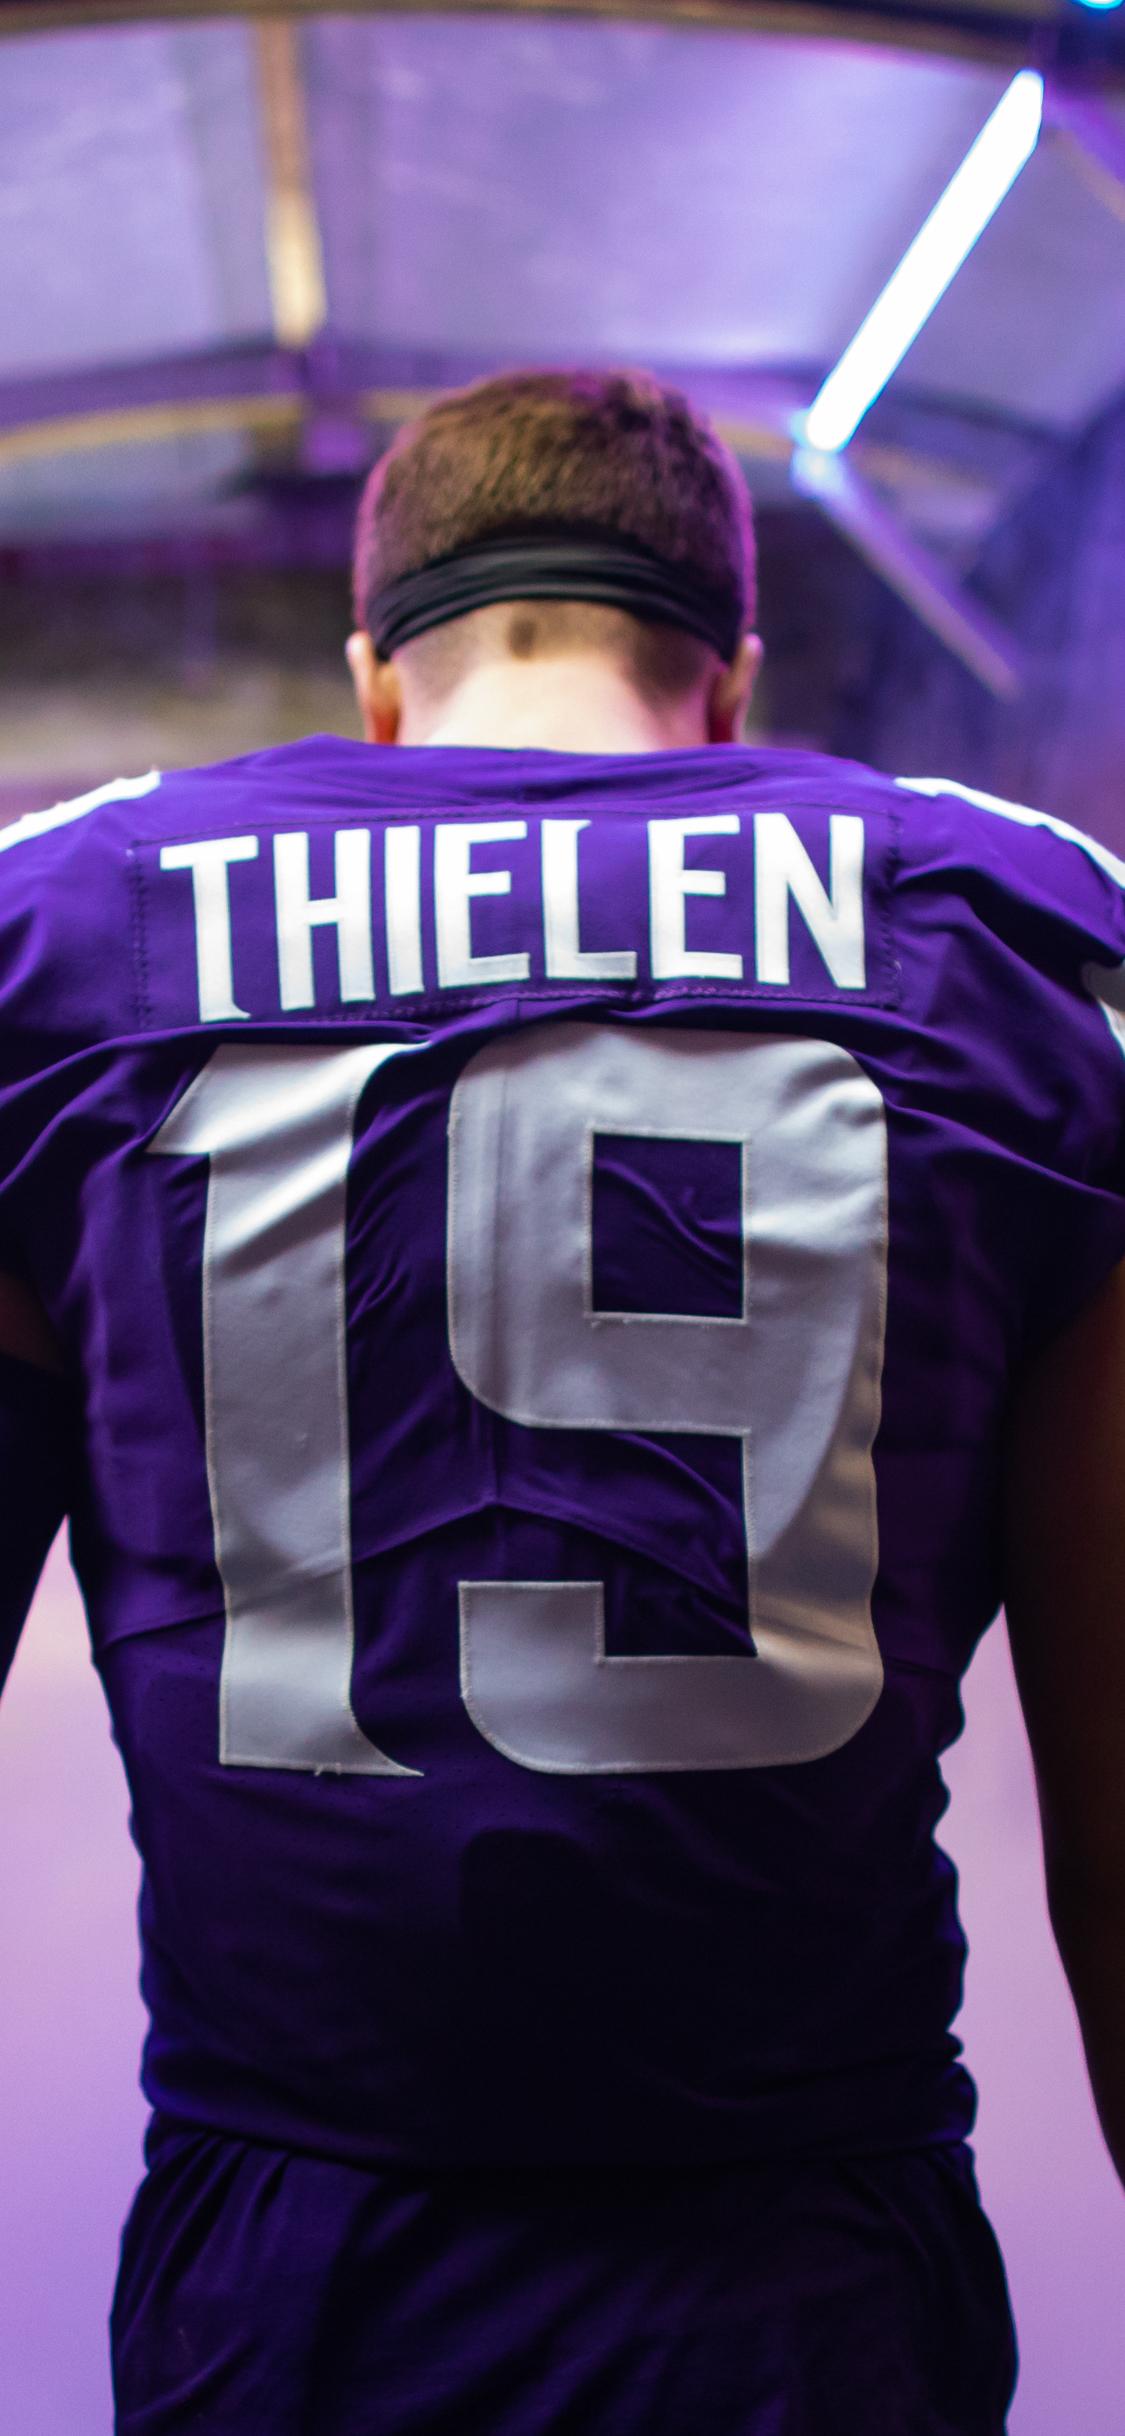 best loved 70442 bfd78 Mobile Wallpaper - Official website of the Minnesota Vikings